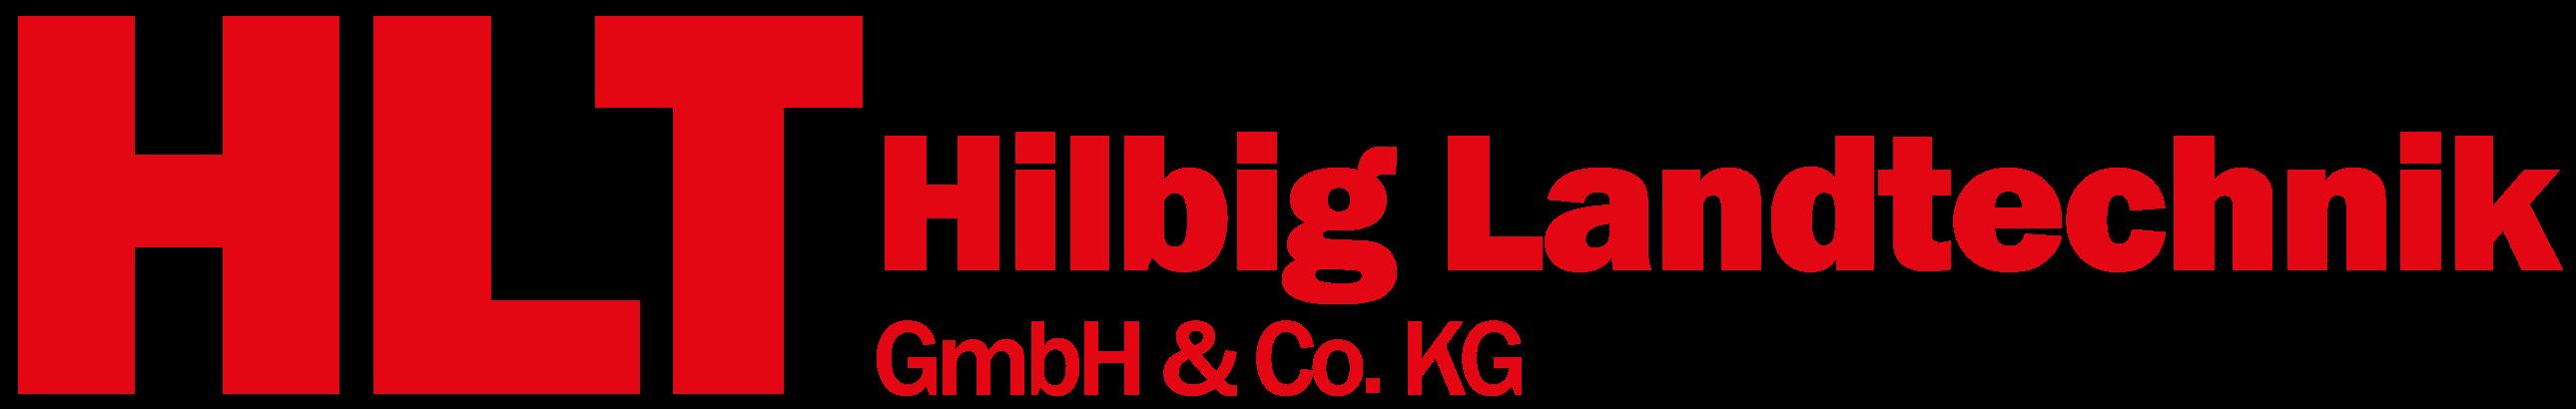 Hilbig Landtechnik GmbH & Co KG